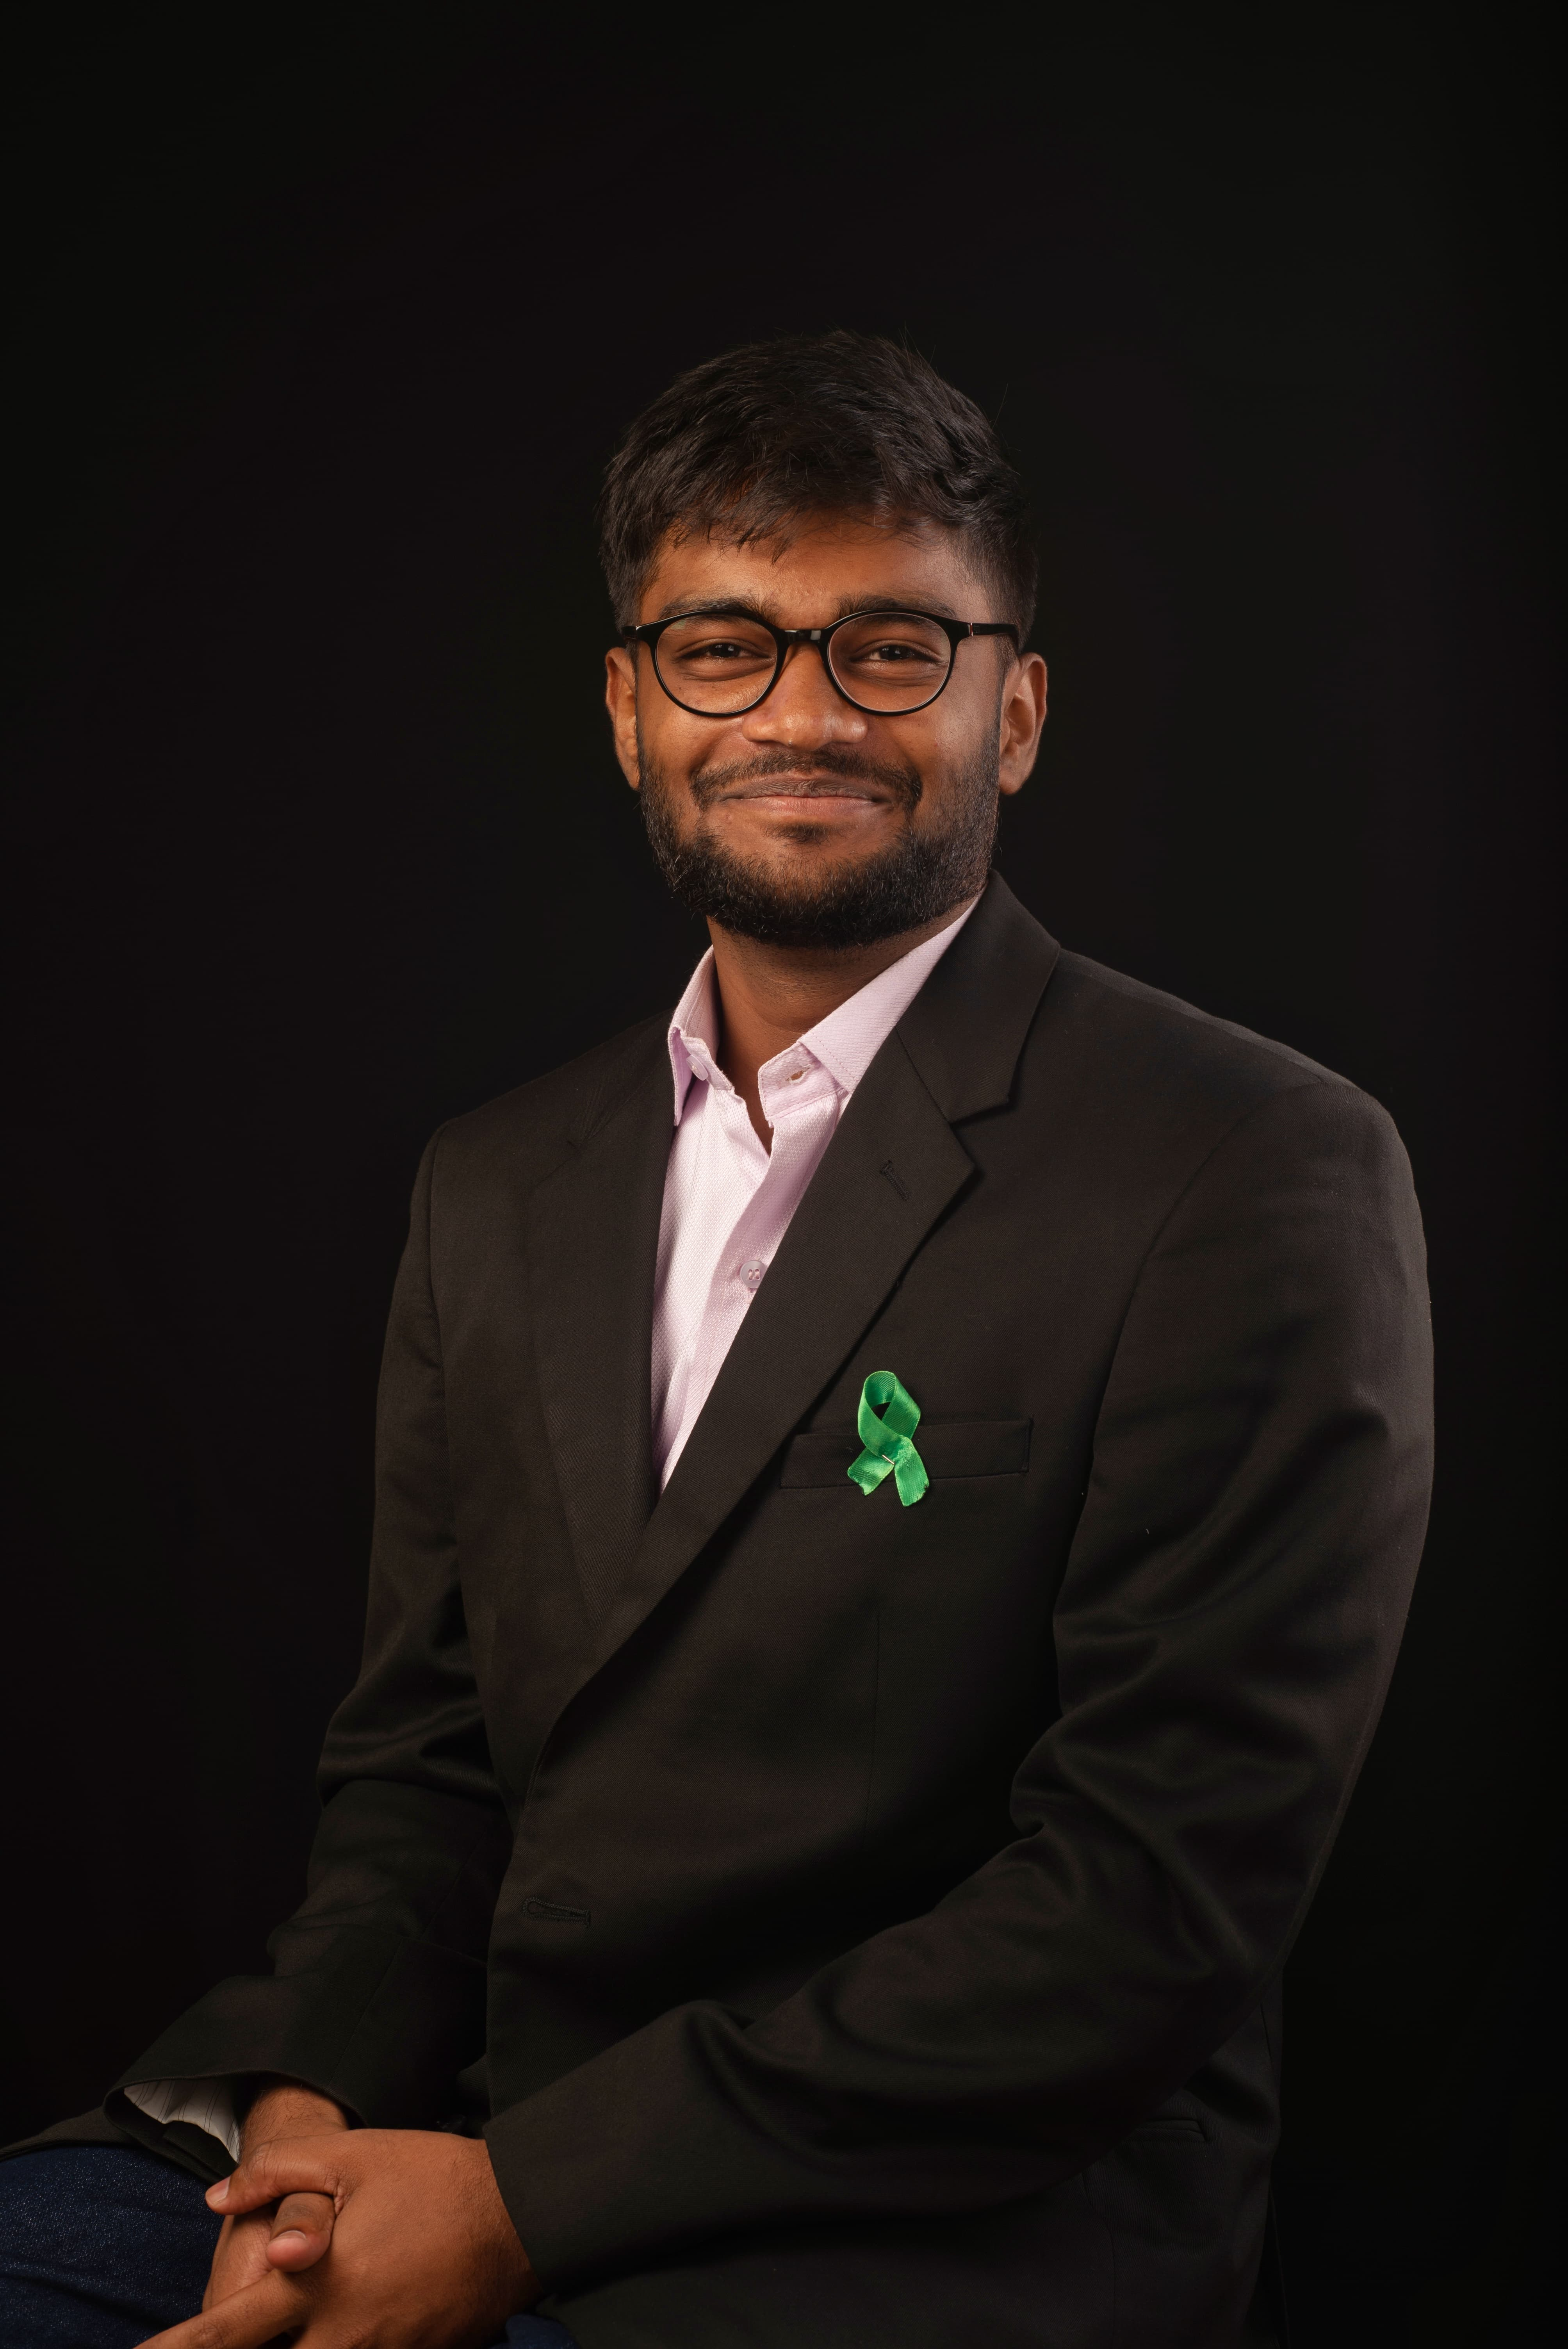 Vivek Khedkar